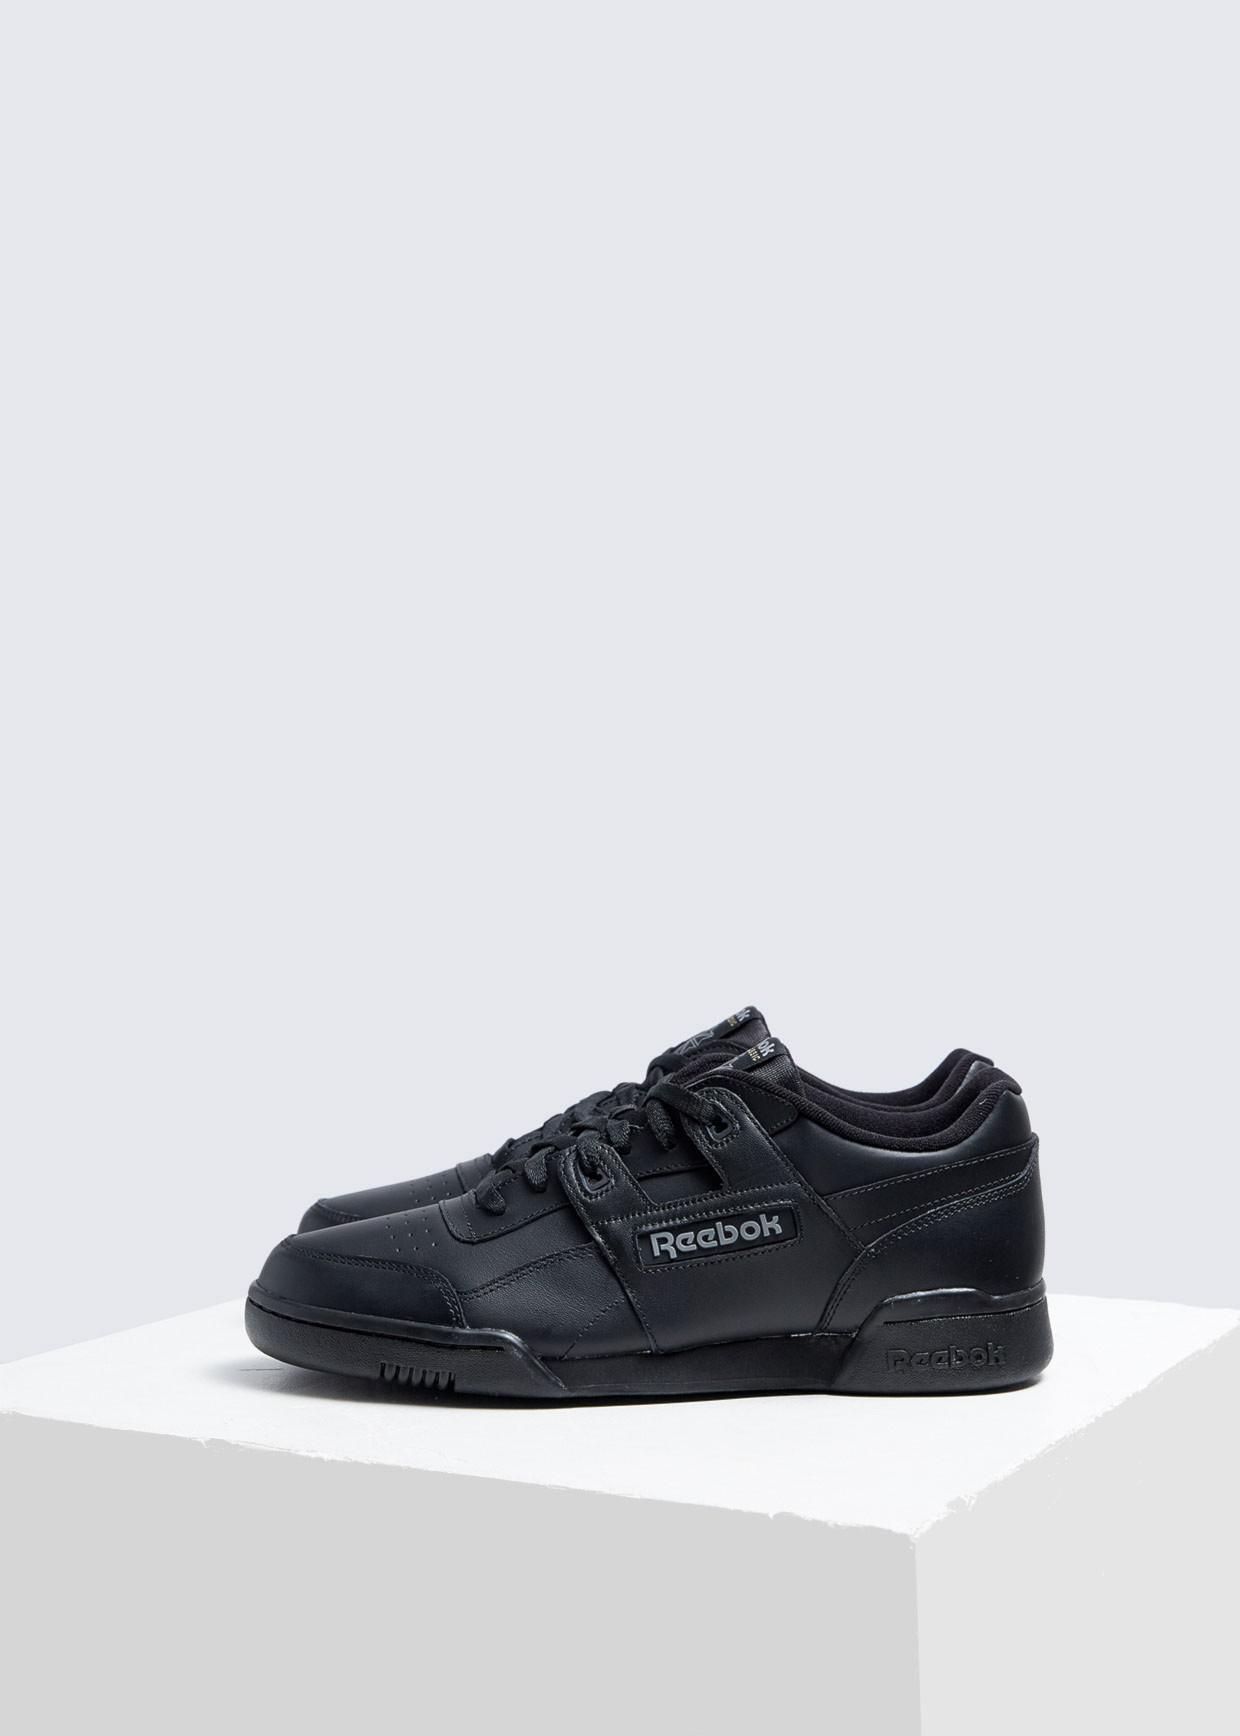 Reebok Workout Plus in Black for Men - Lyst 45d9213c8